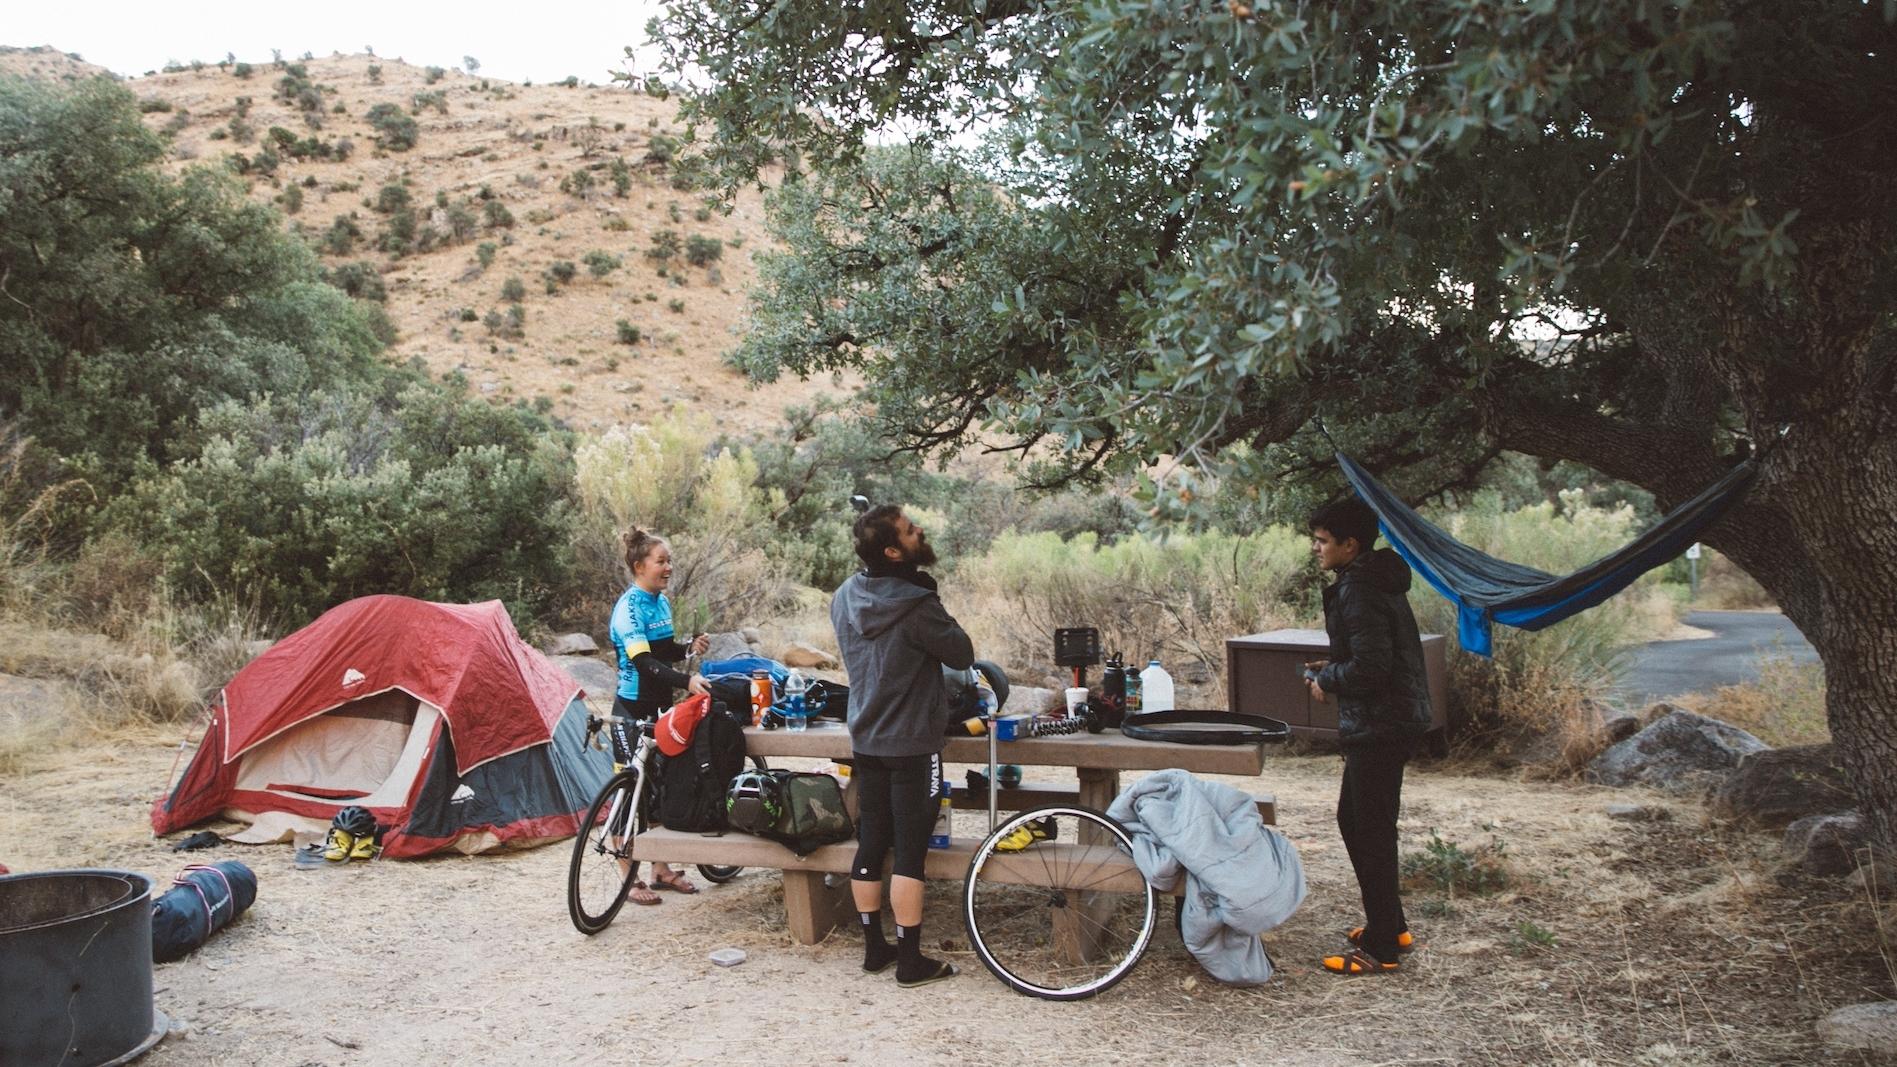 Morning campsite Mt Lemmon